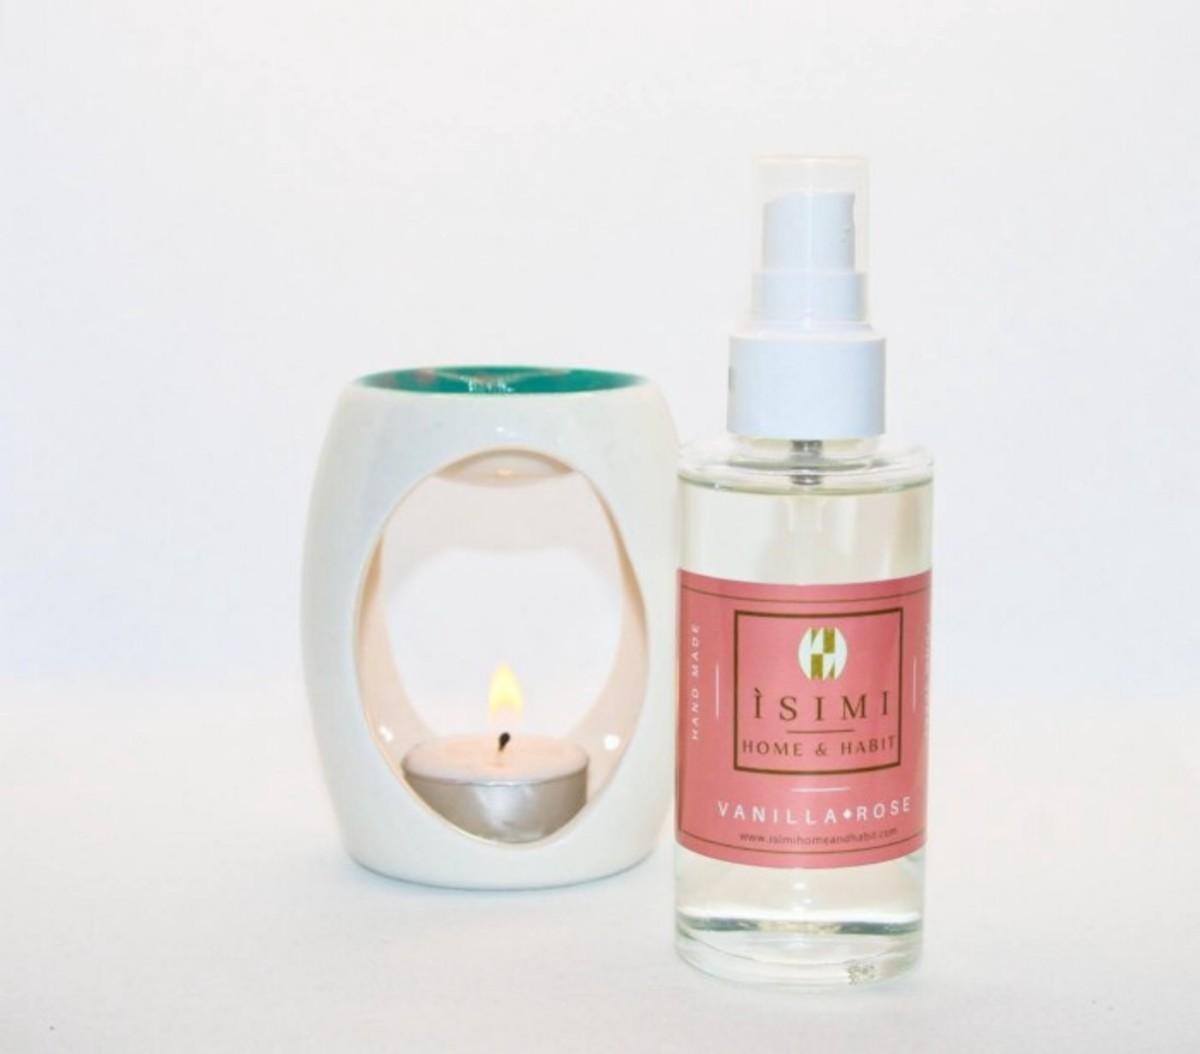 Vanilla Rose Room Spray from ÌSIMI Home and Habit